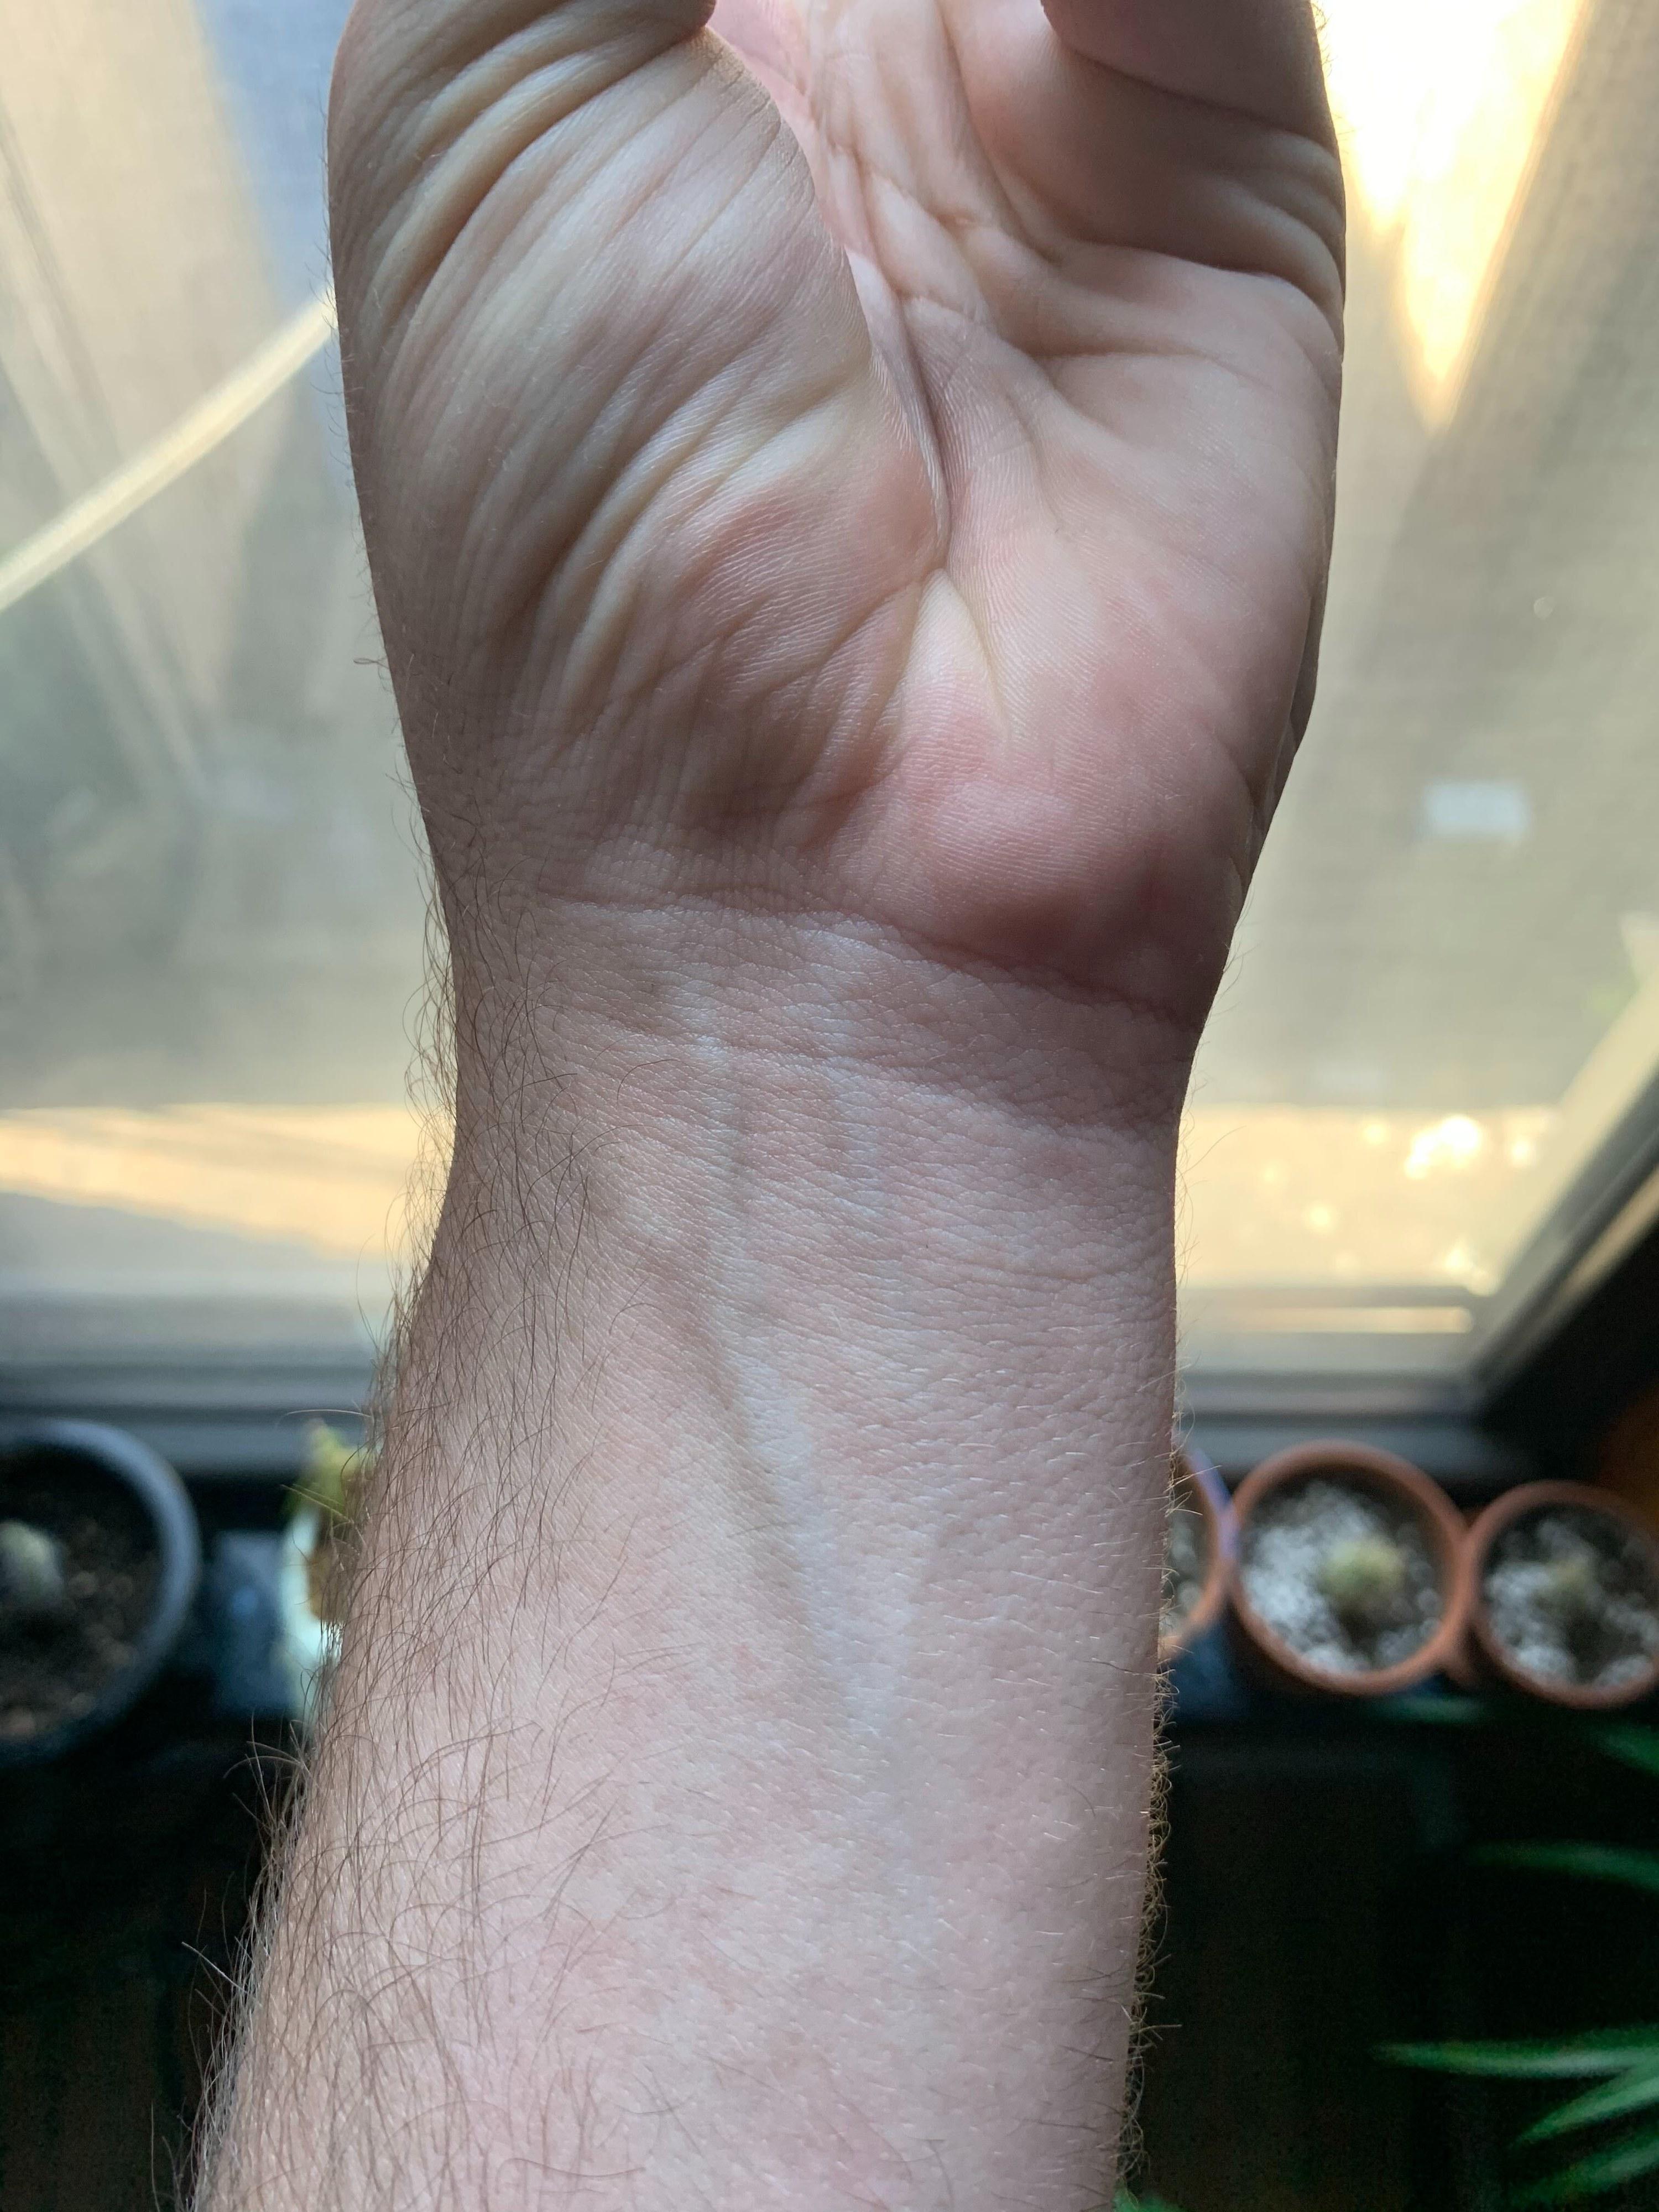 A wrist doing the same flex, but it's flat